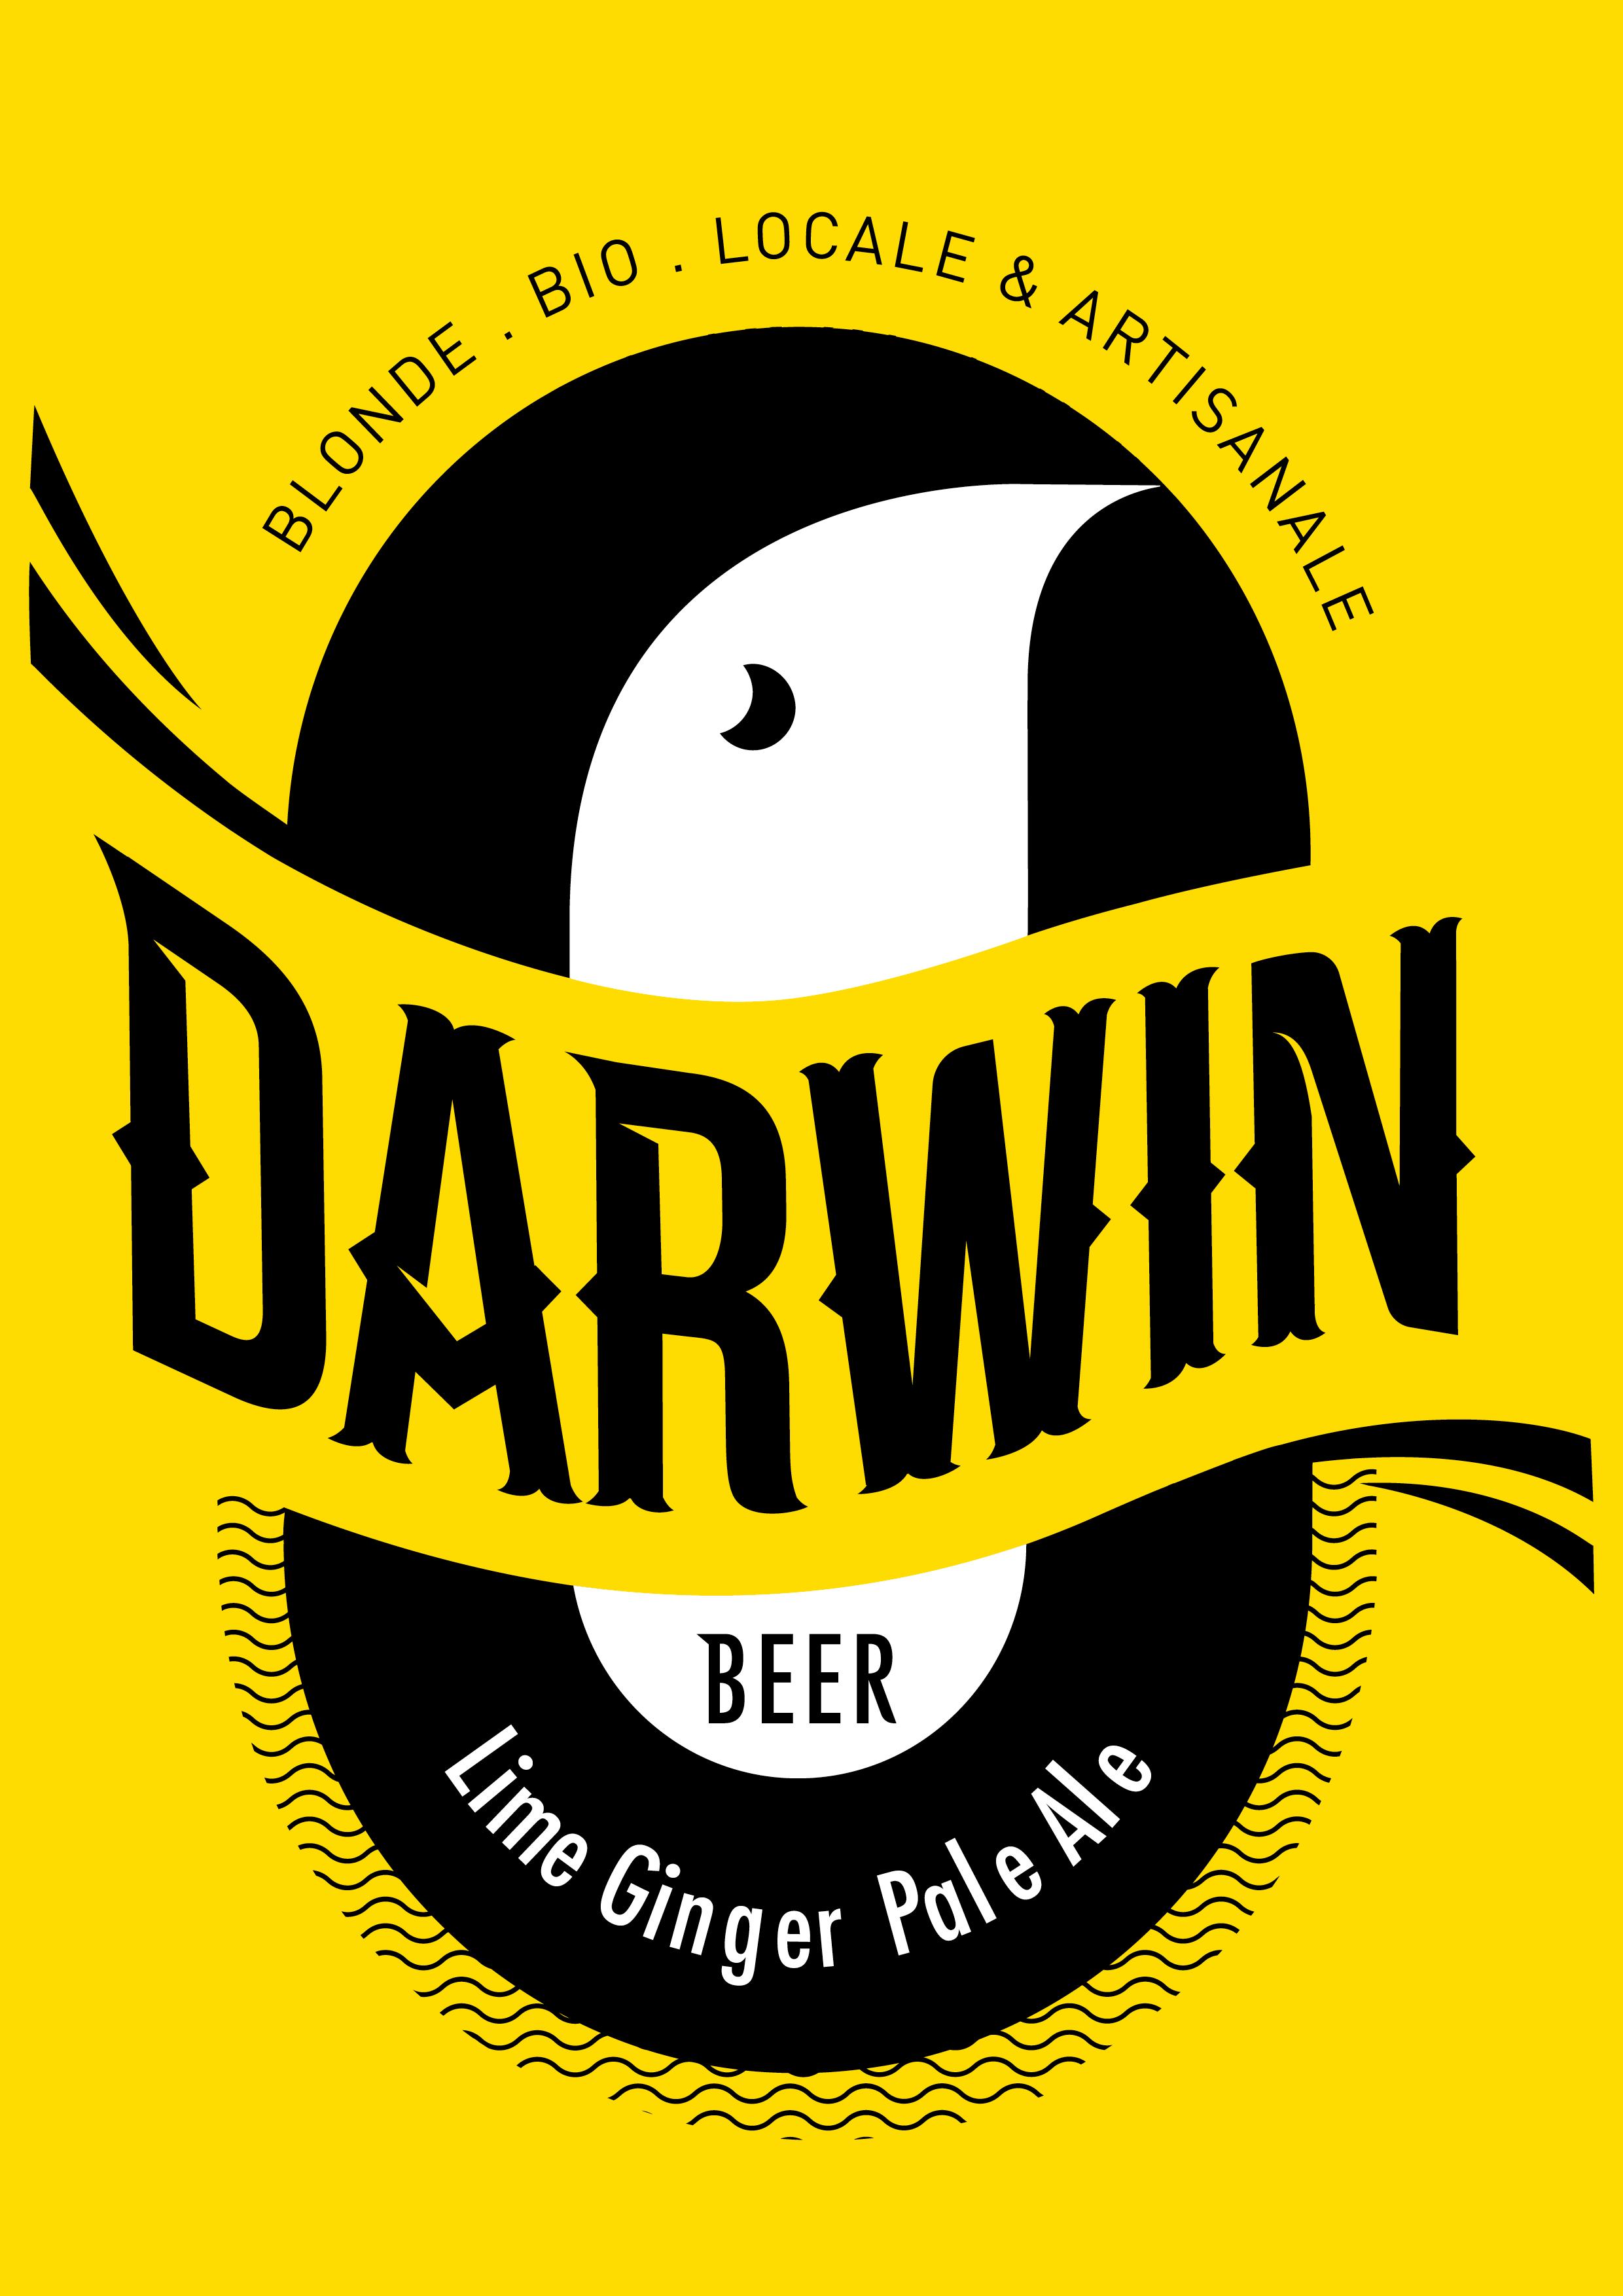 darwin beer